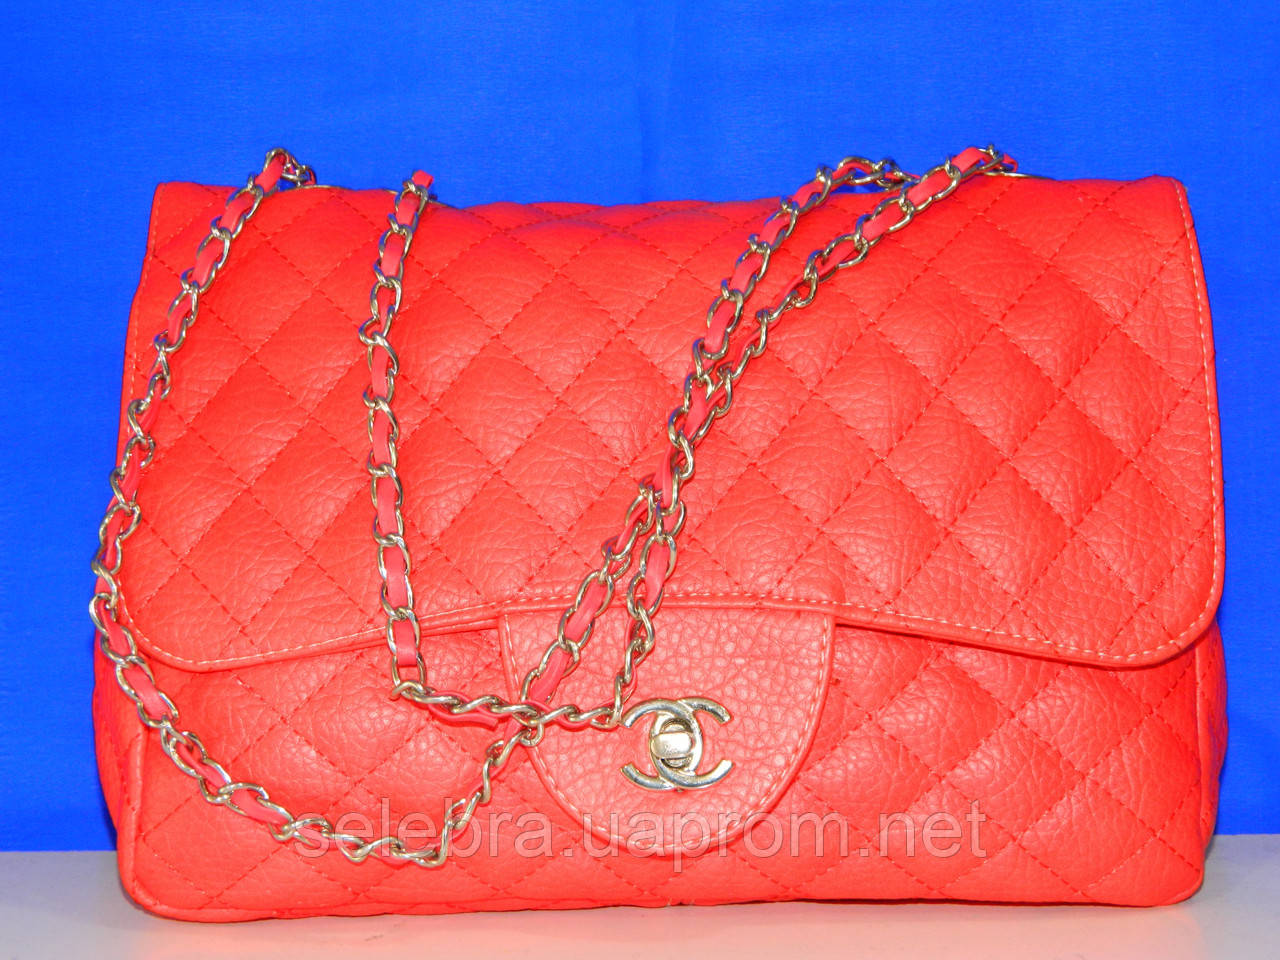 Сумки Шанель сумки Chanel сумка коко шанель